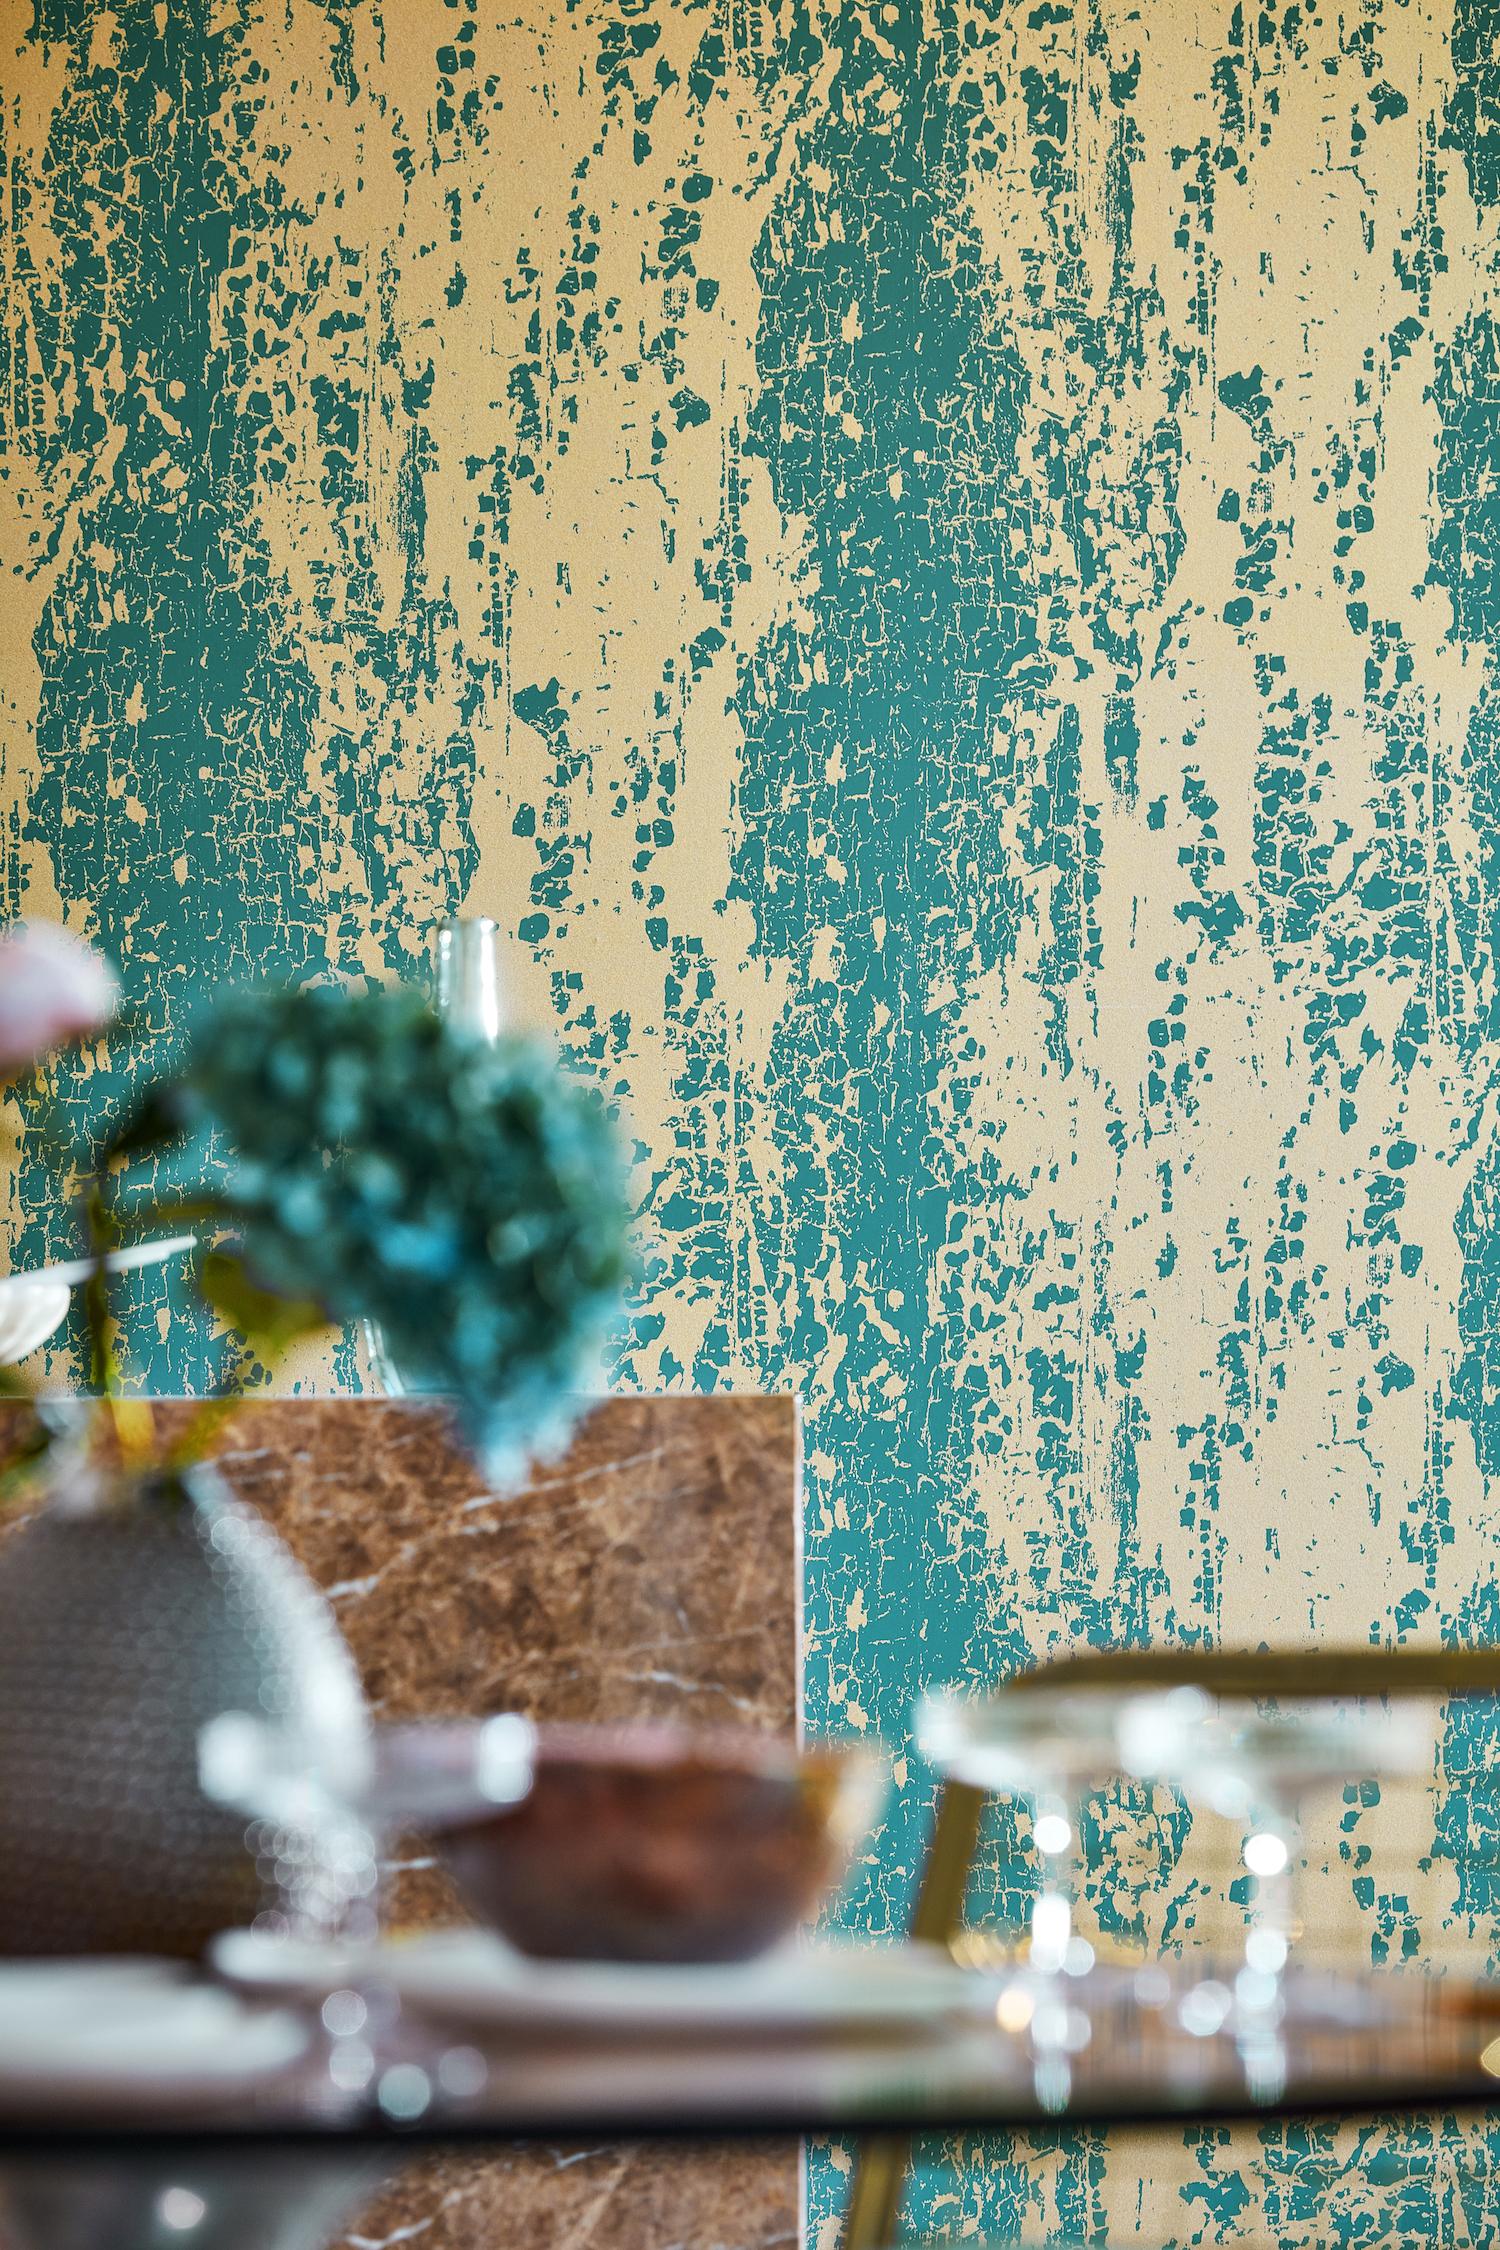 Wallpaper: Crystal Extravagance - £95 per 10m roll